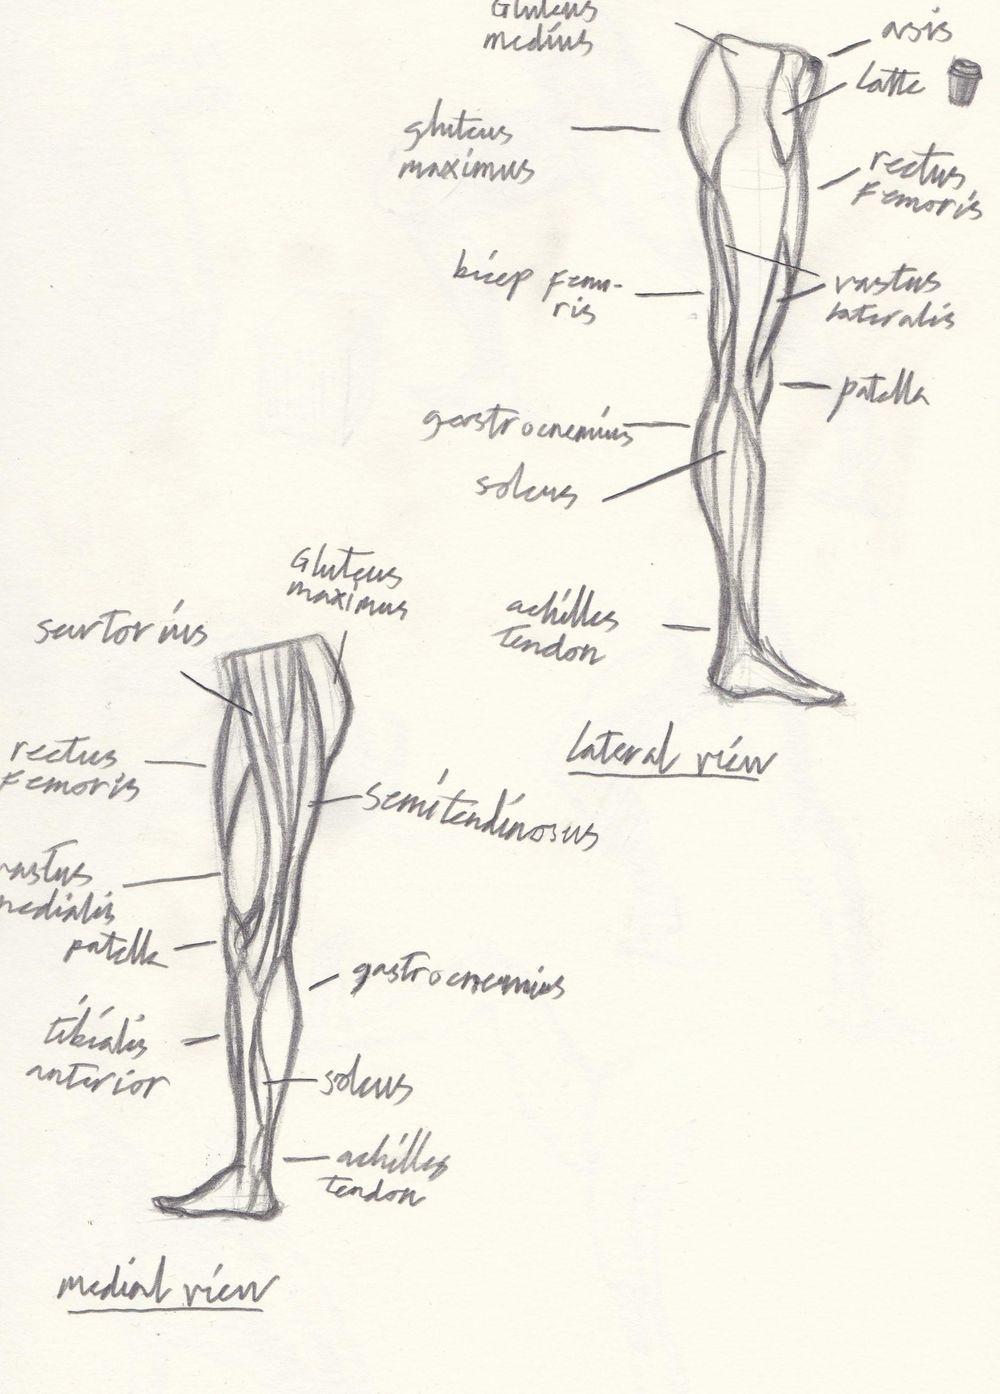 leg anatomy - image 2 - student project